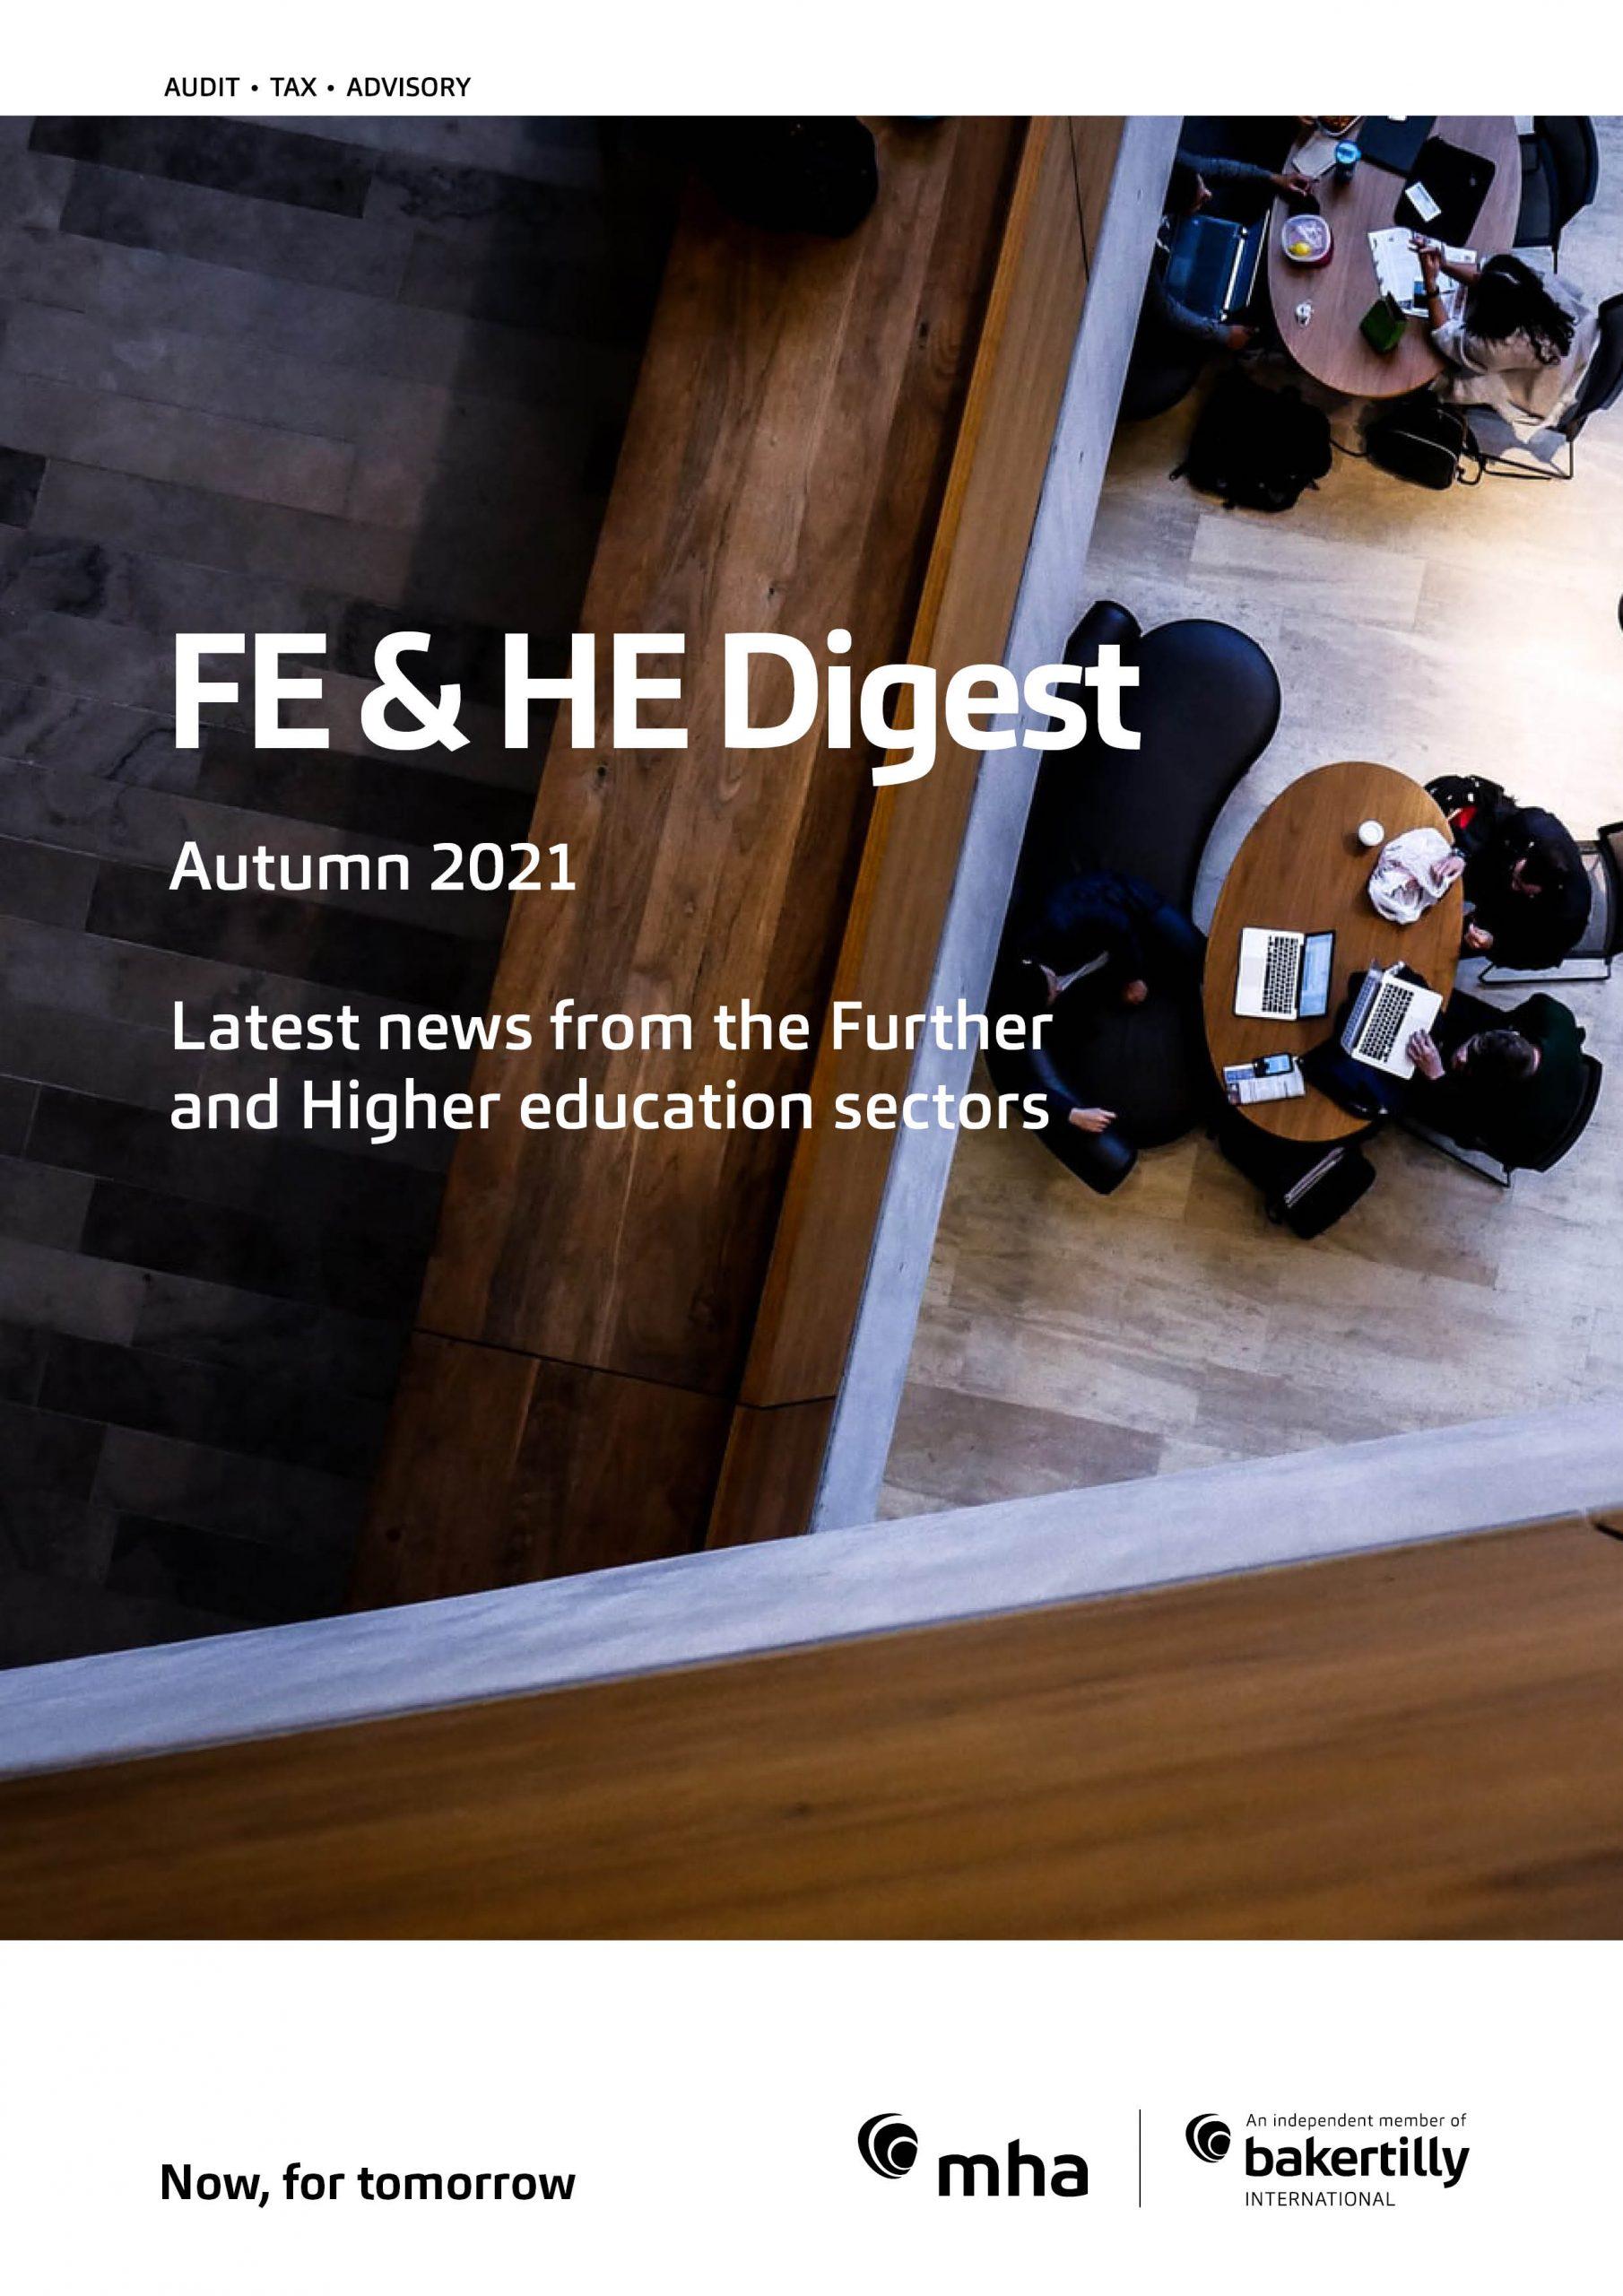 FE & HE Digest – Autumn 2021